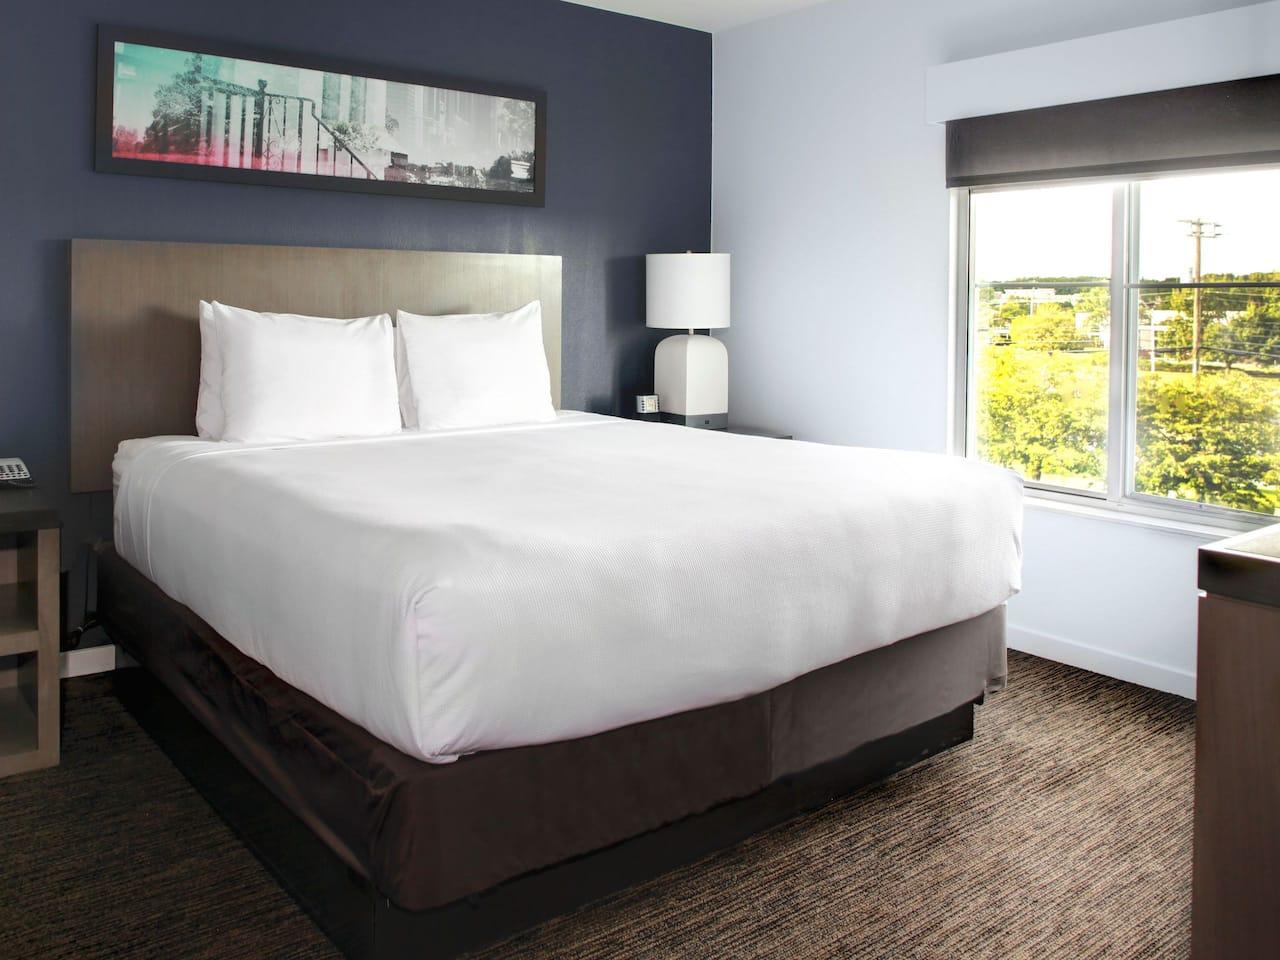 Guestroom king sized bed at Hyatt House Boston / Burlington